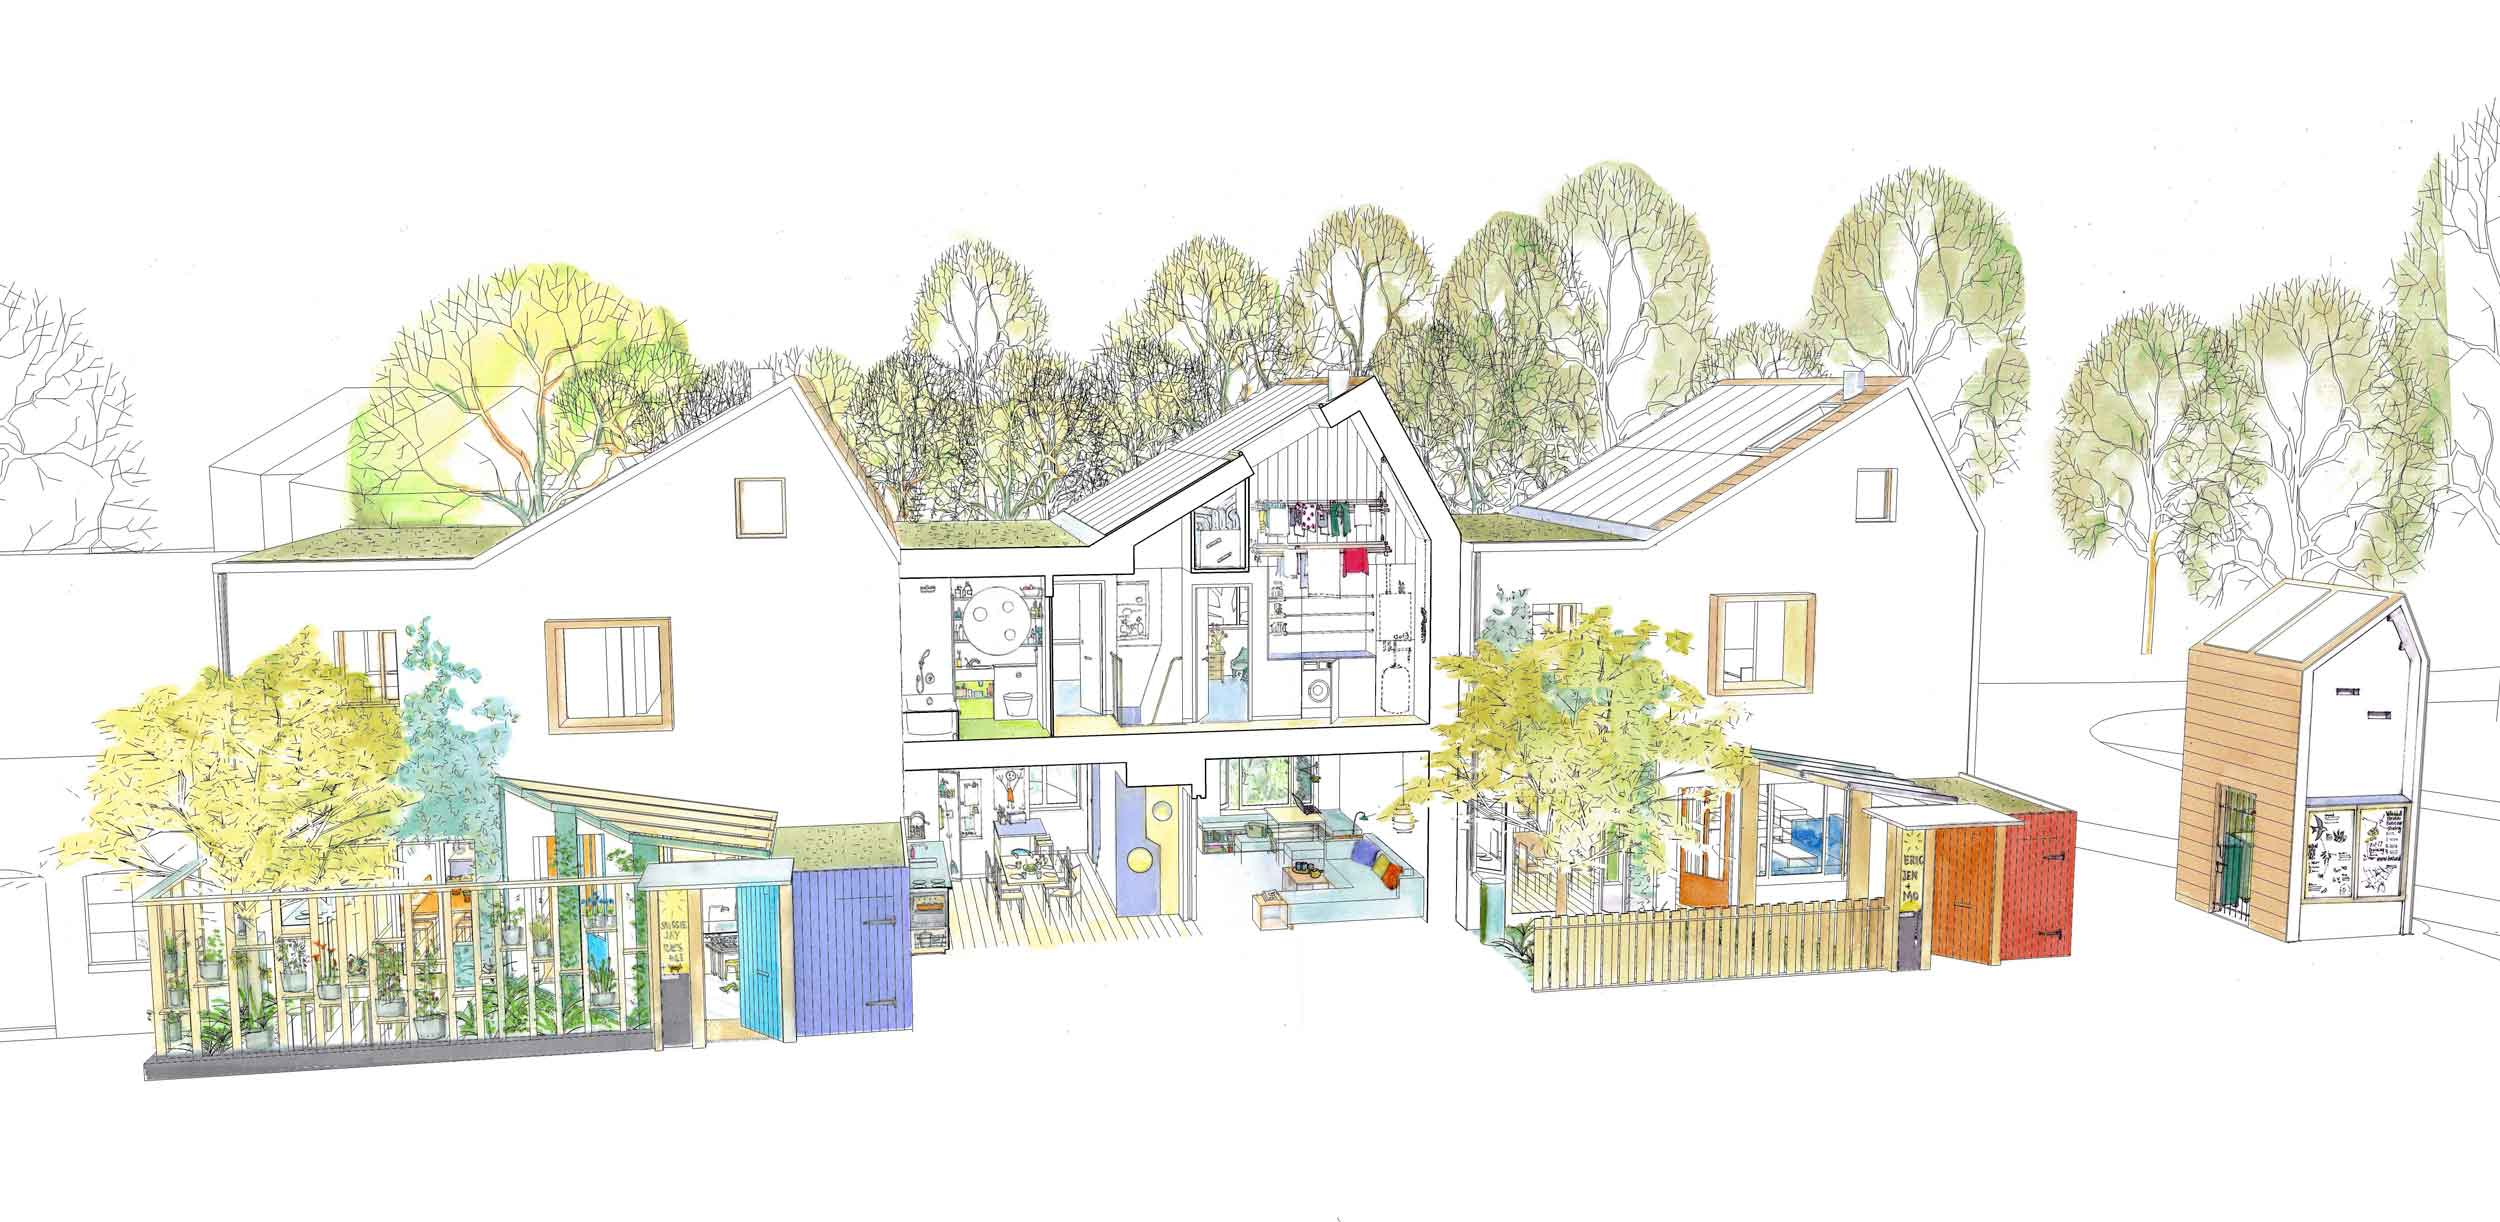 Exhibition Mews Ash Sakula three houses concept sketch